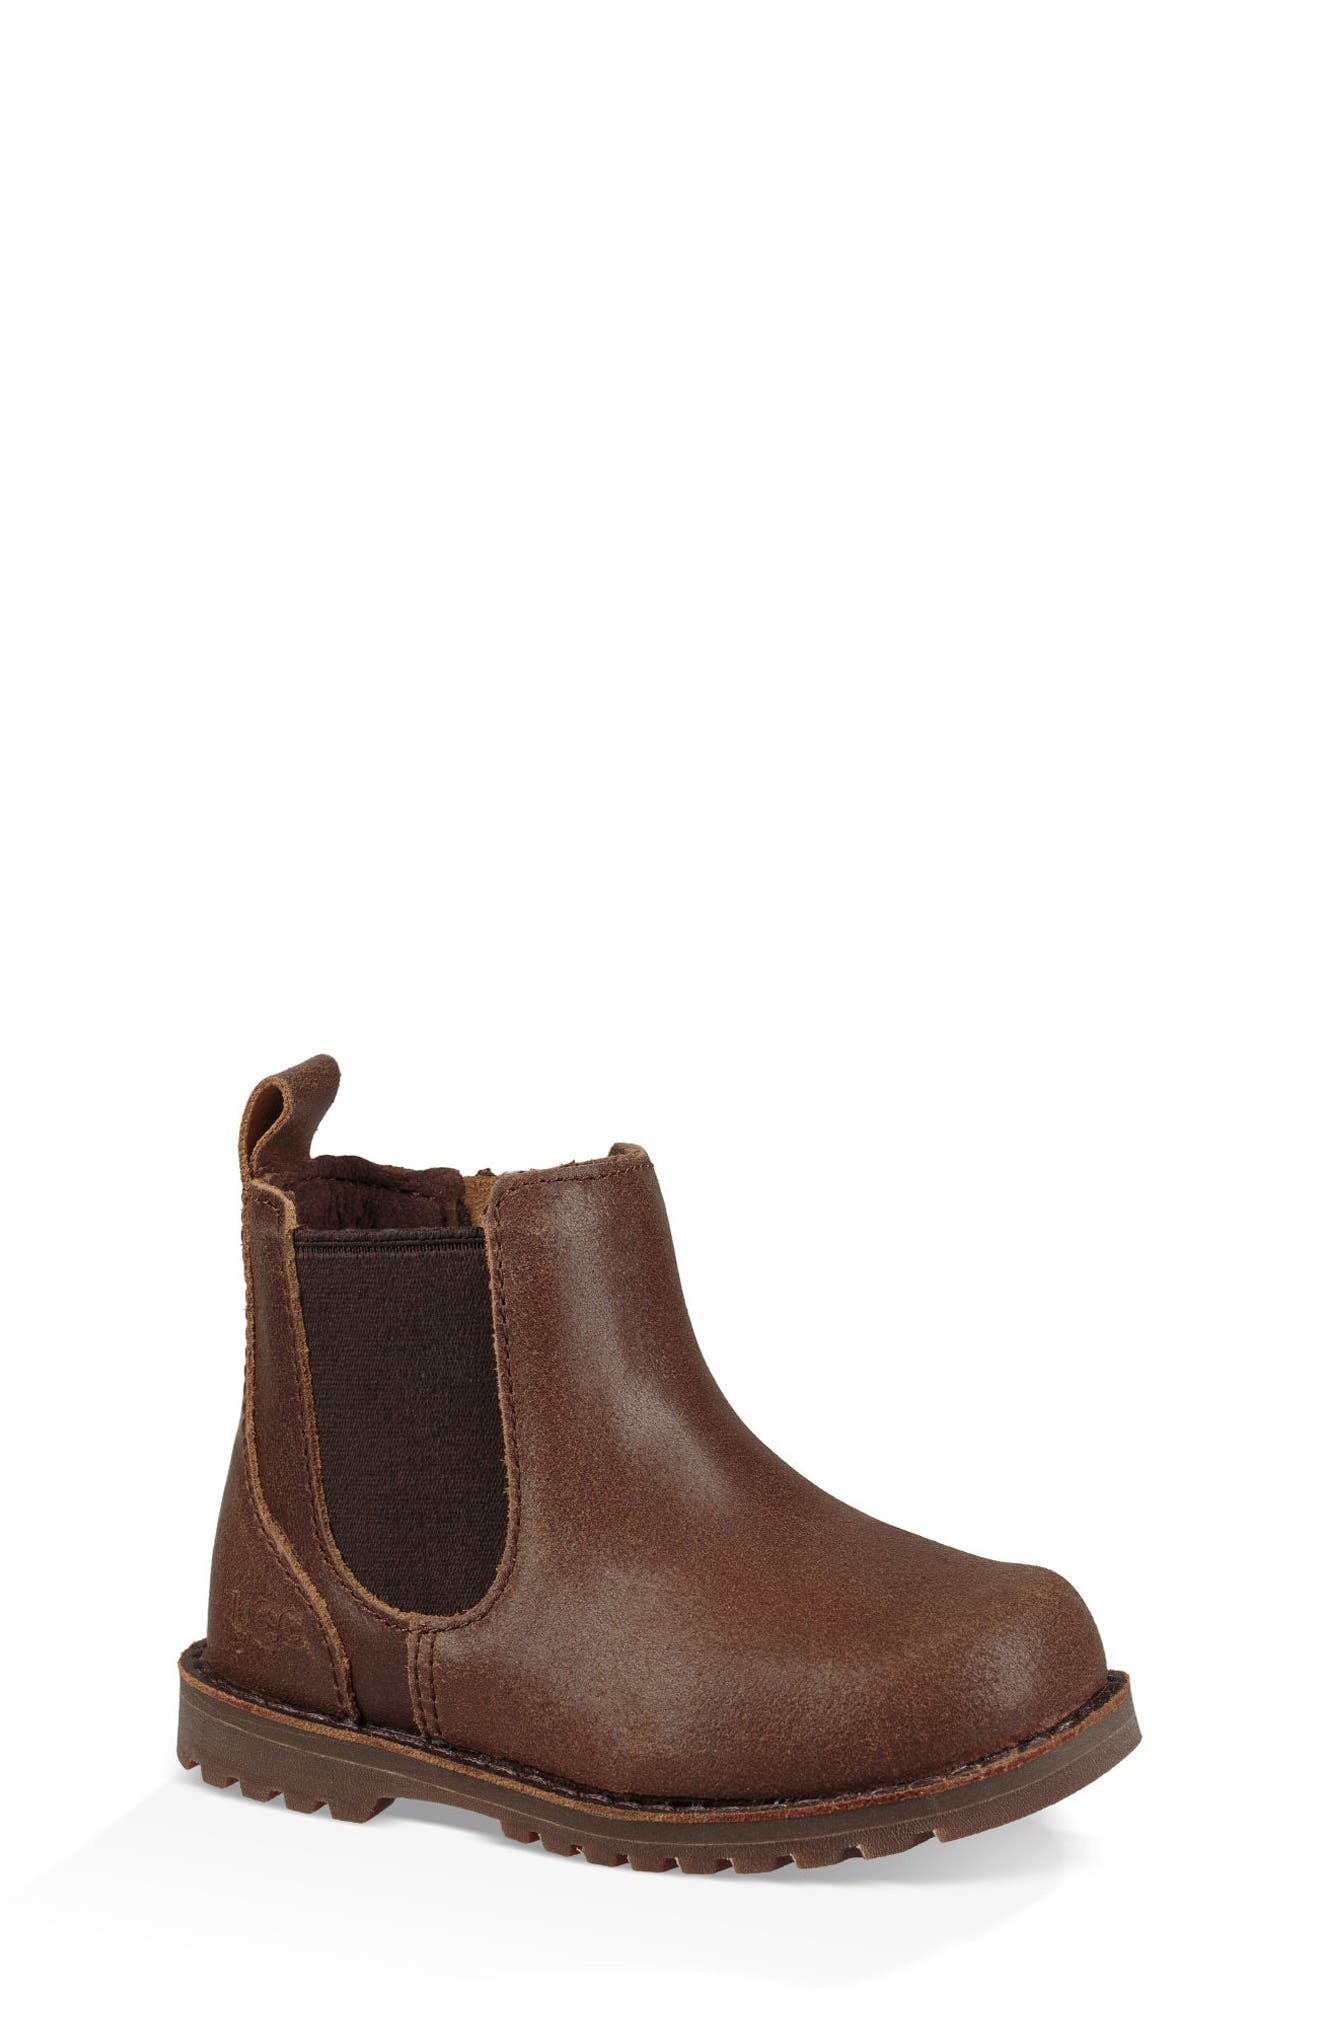 Callum Water Resistant Chelsea Boot,                             Main thumbnail 1, color,                             Chocolate Brown